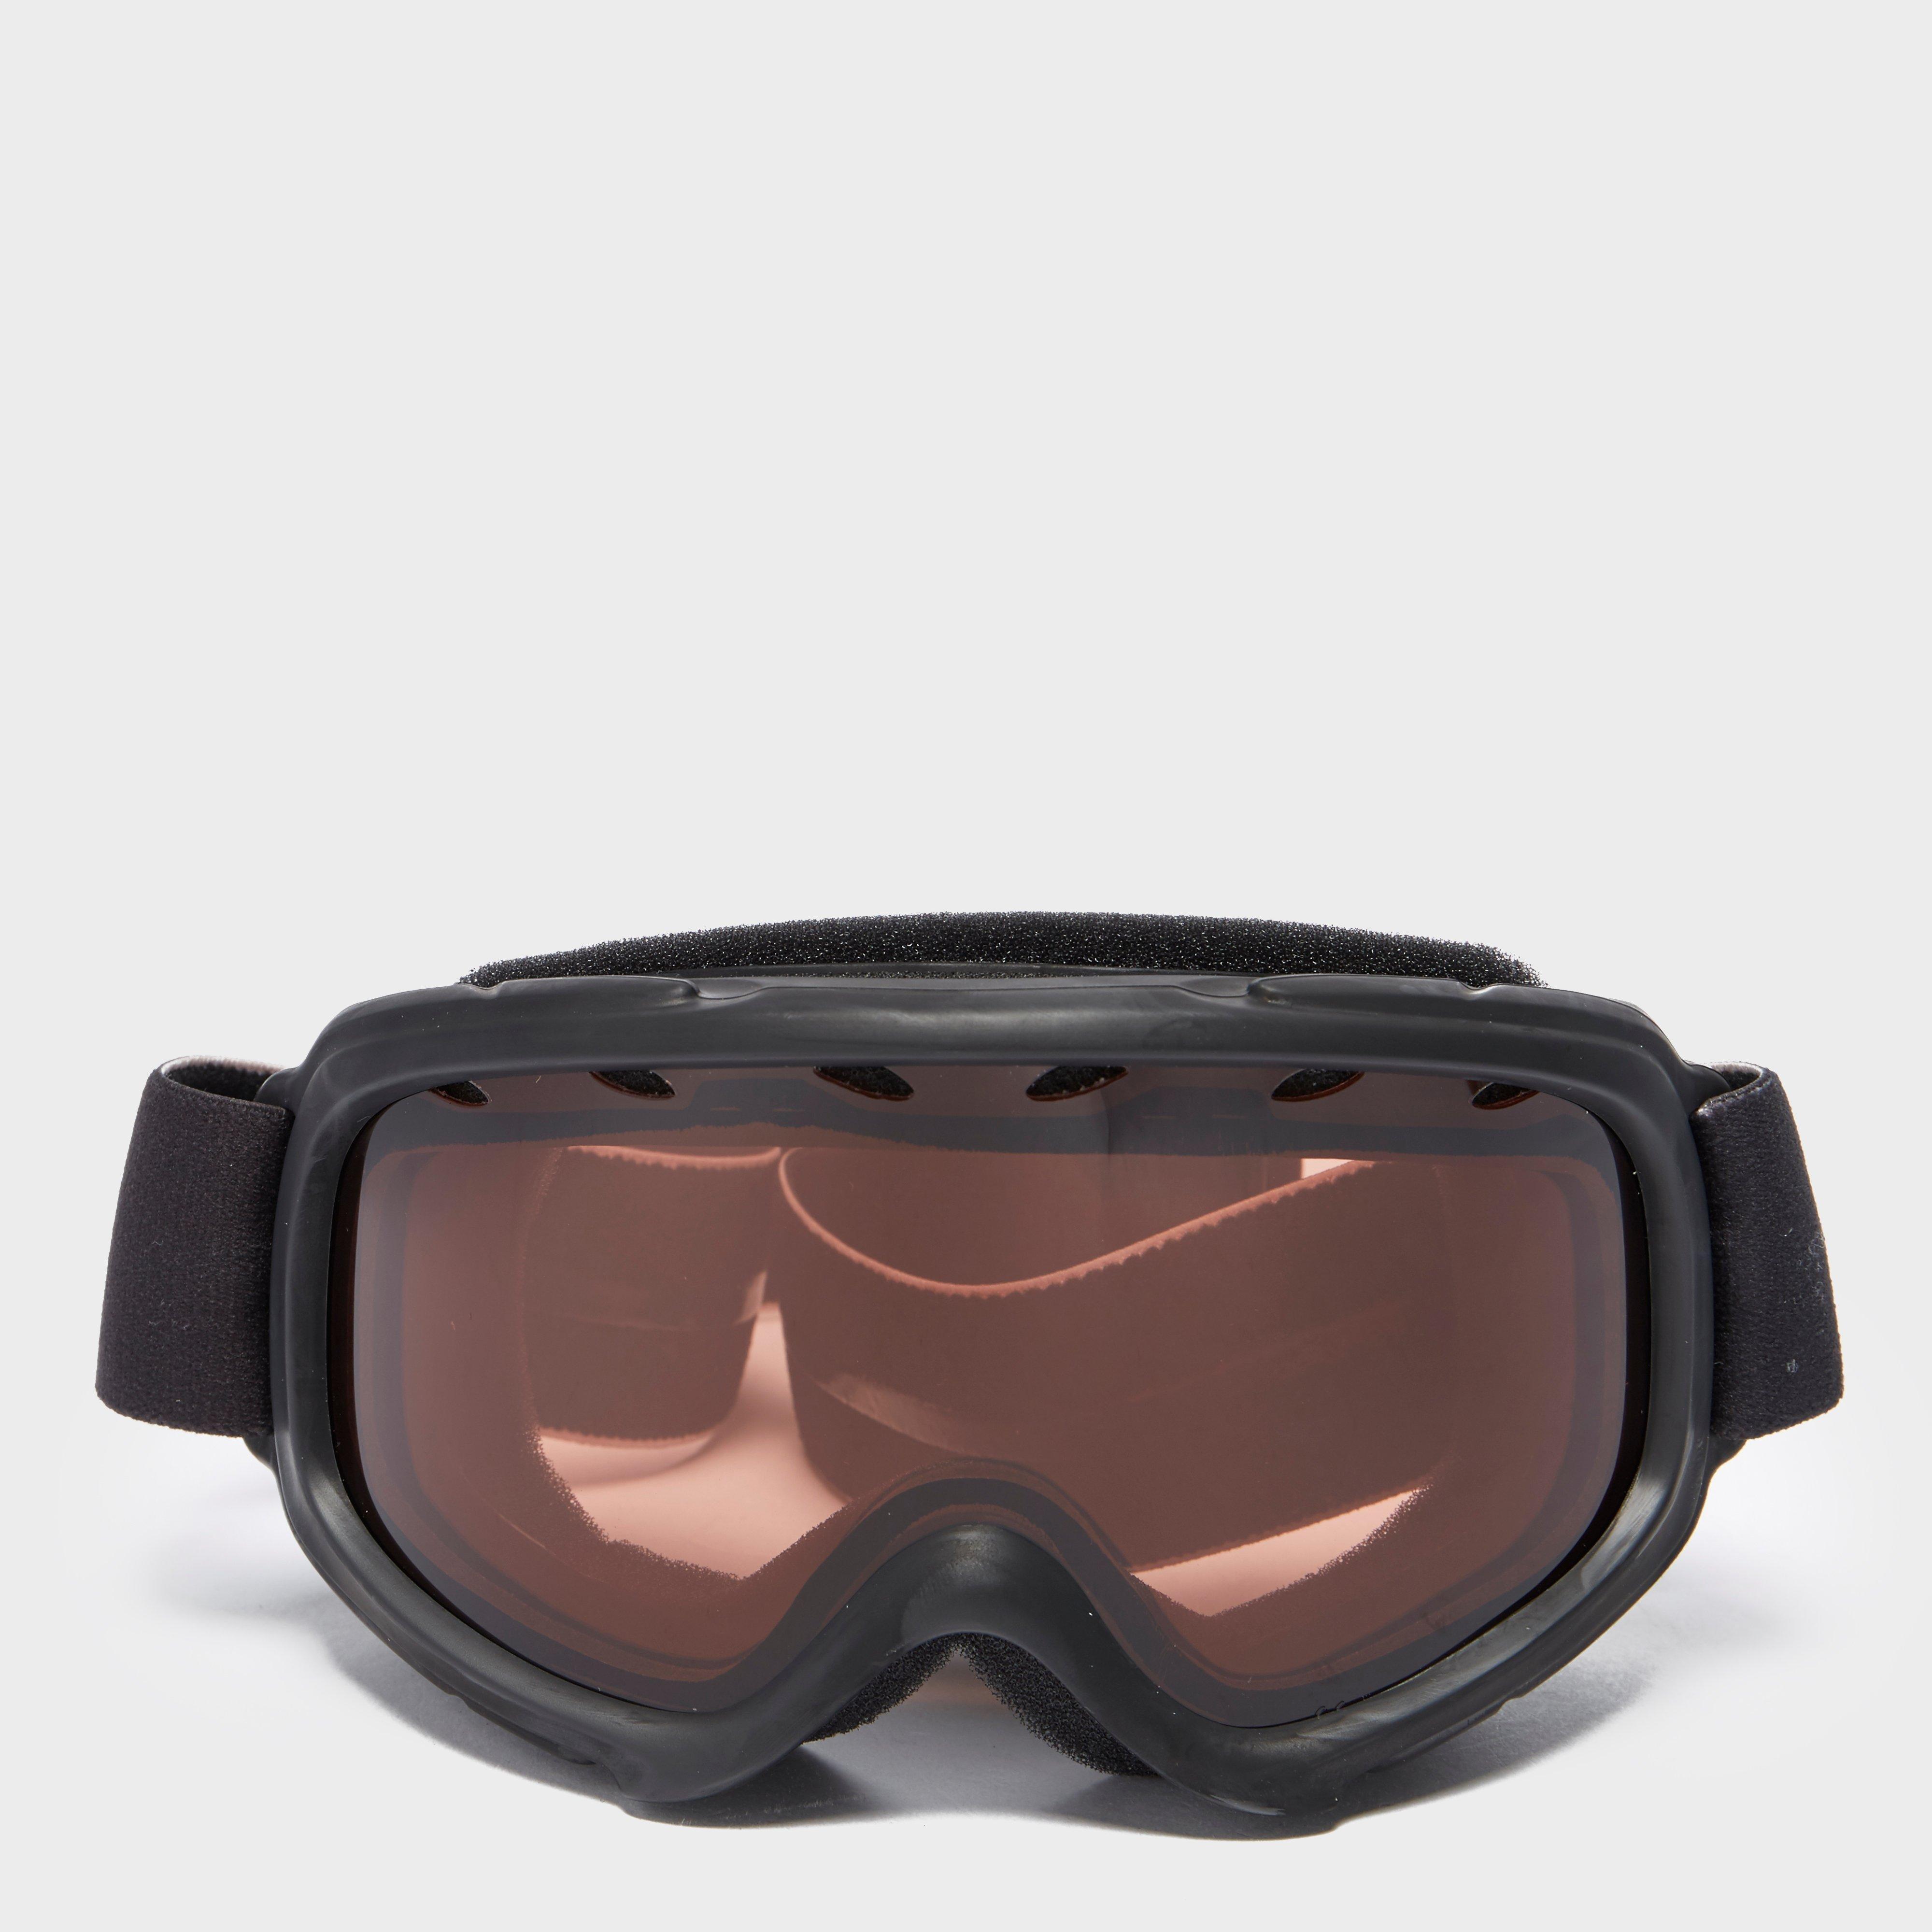 Smith Kids Gambler Air Ski Goggles - Black/blk  Black/blk